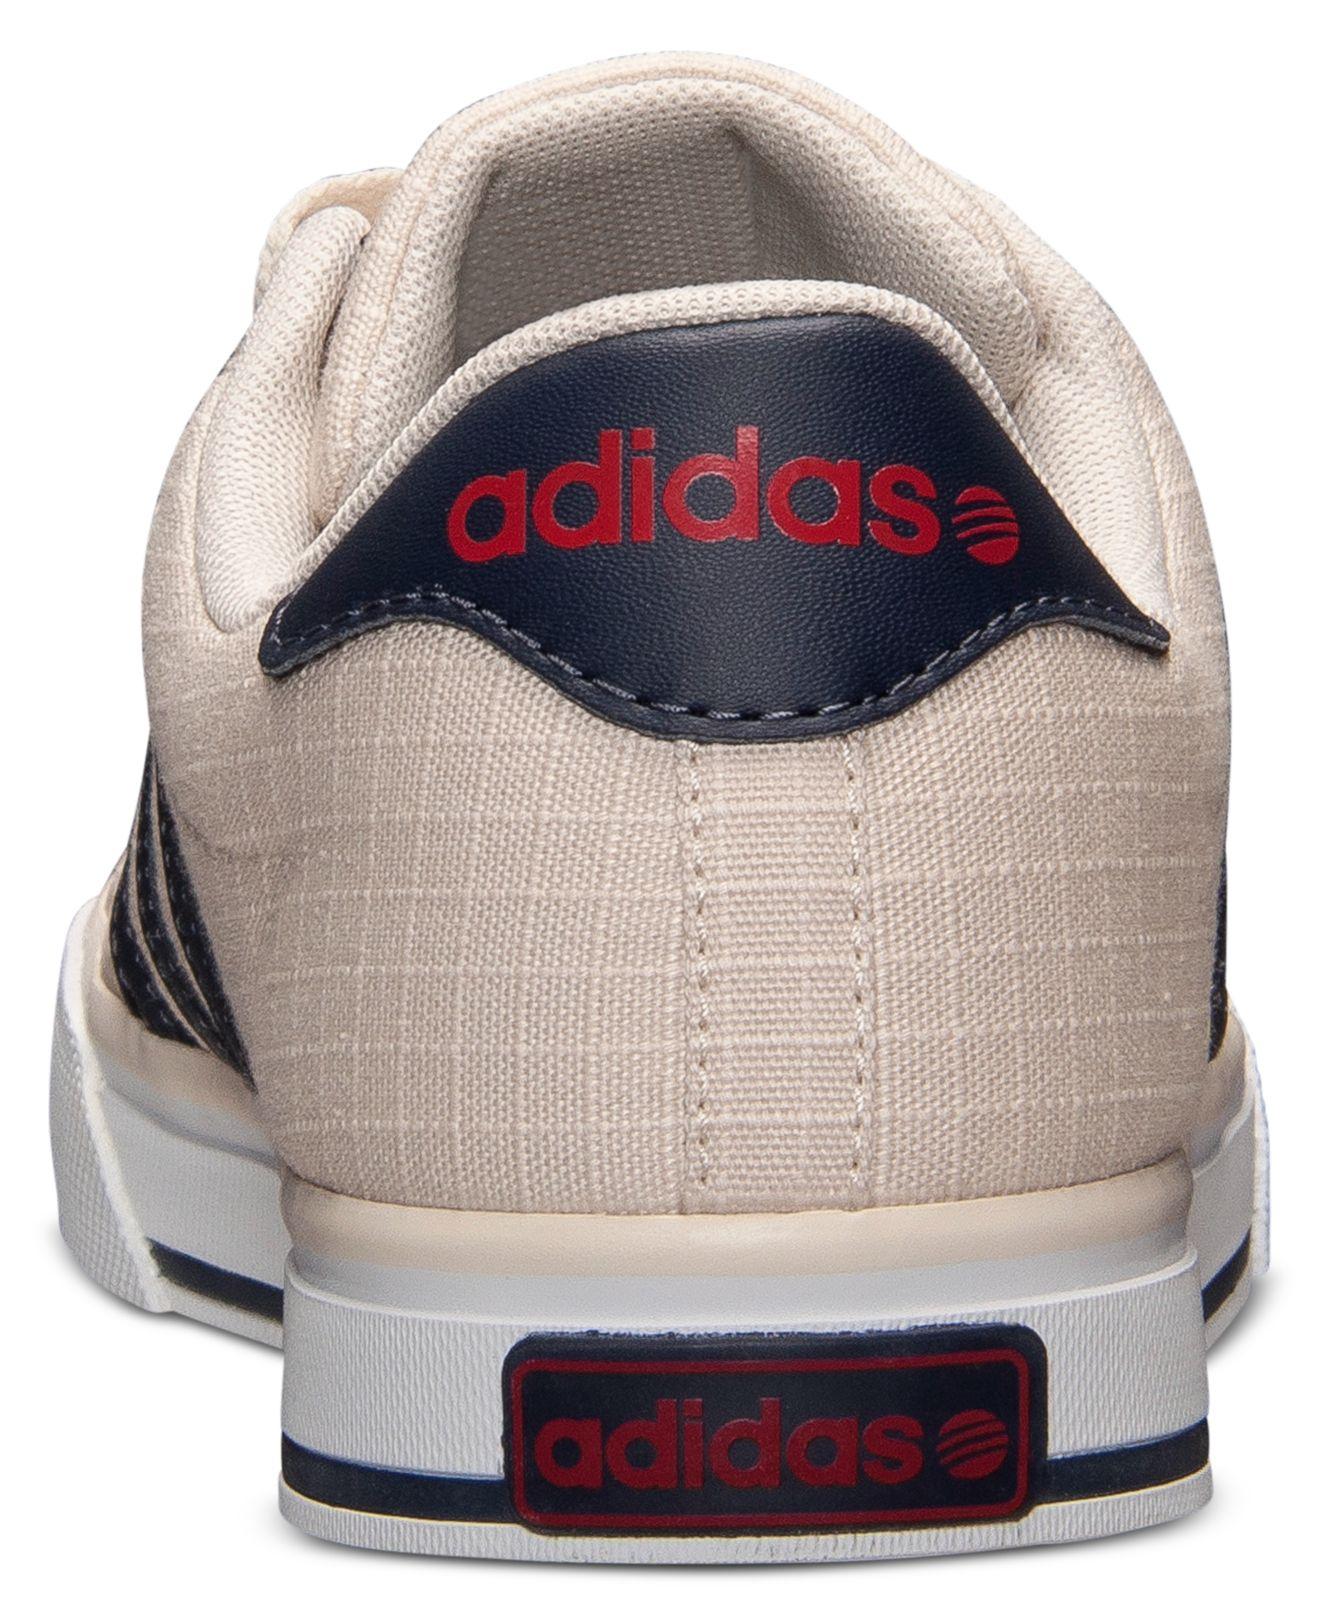 Adidas NEO Daily Vulc en línea